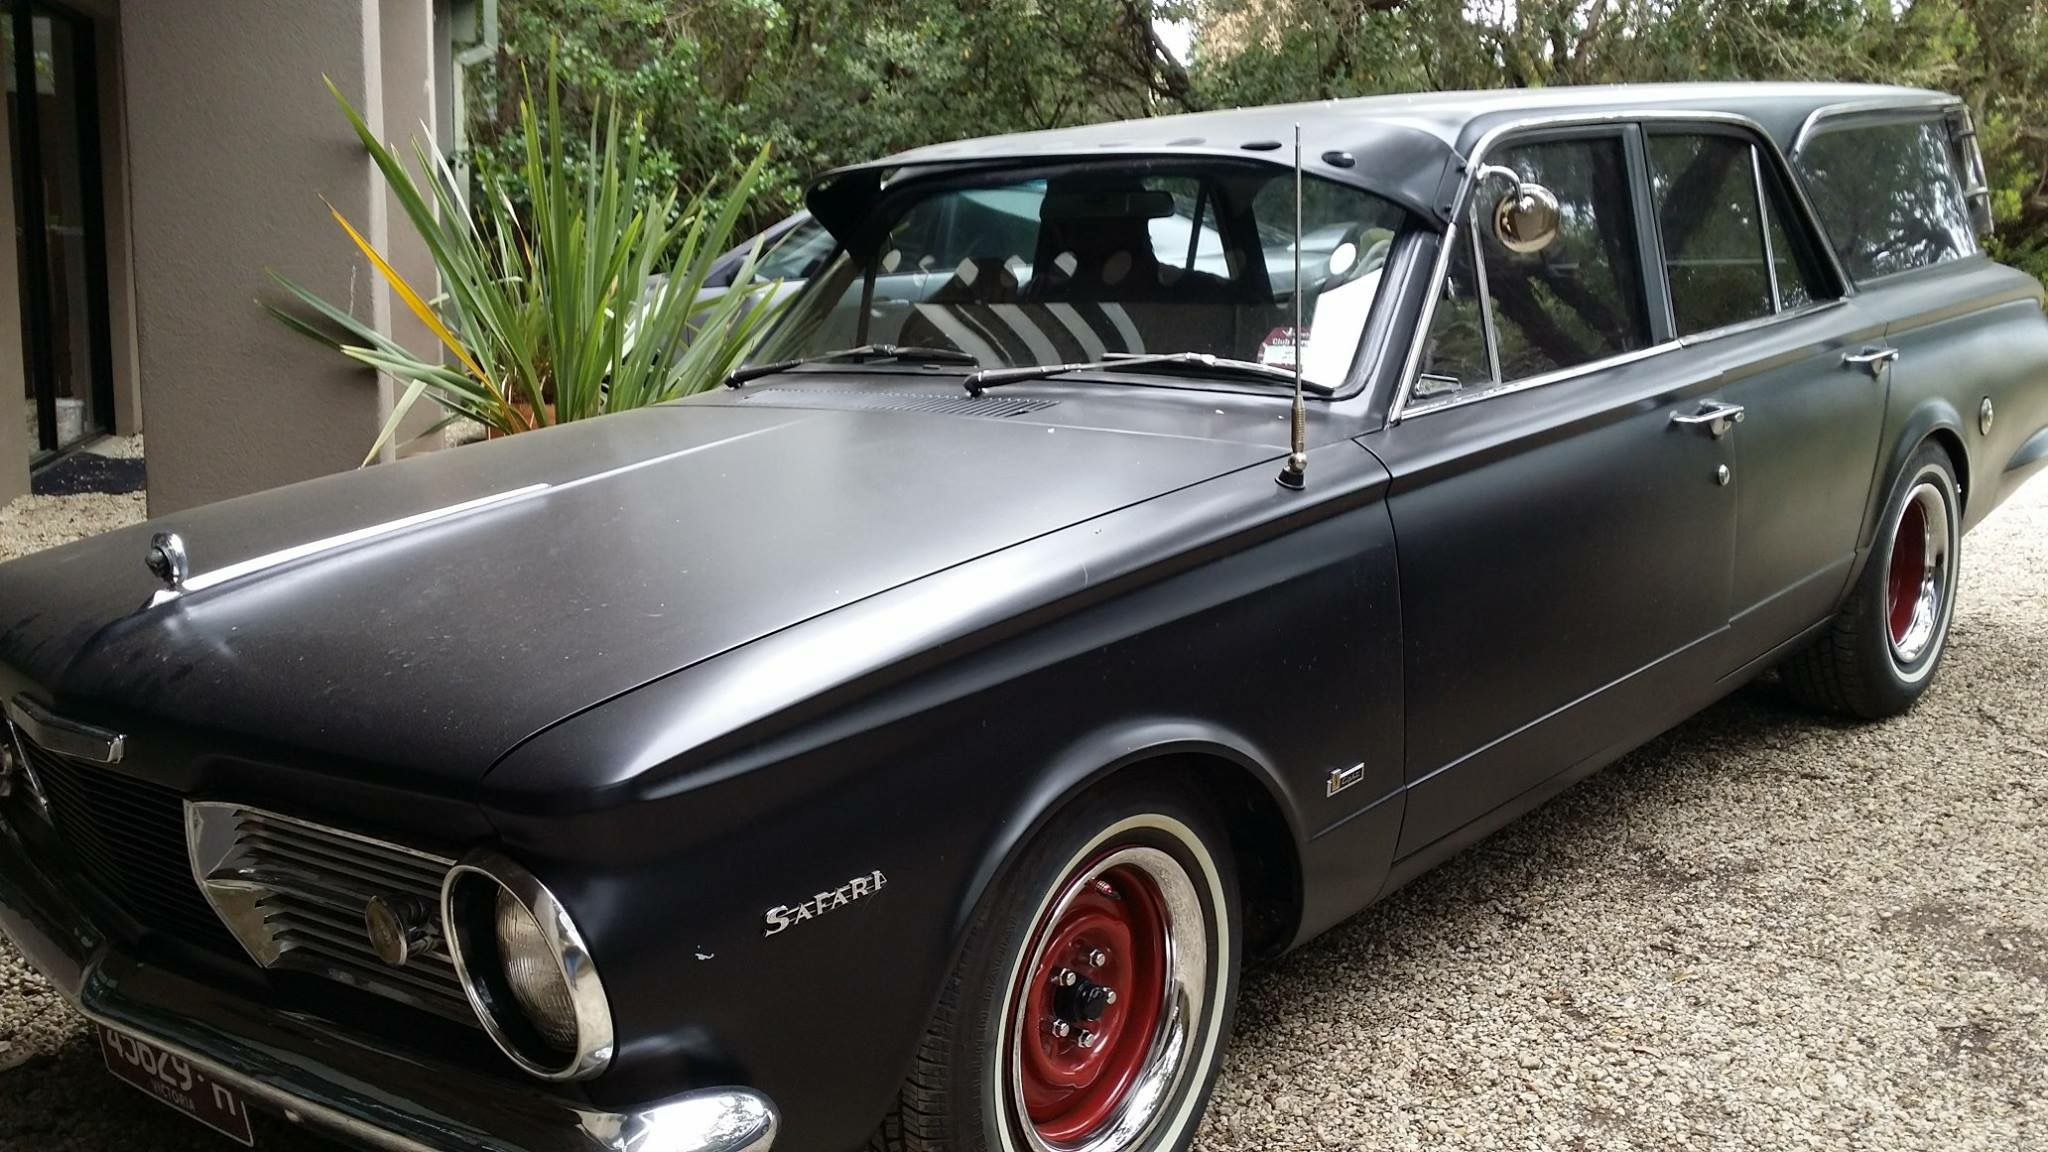 My Ride - 1965 Valiant AP6 Safari Regal. Canadian Body. | OLD ...